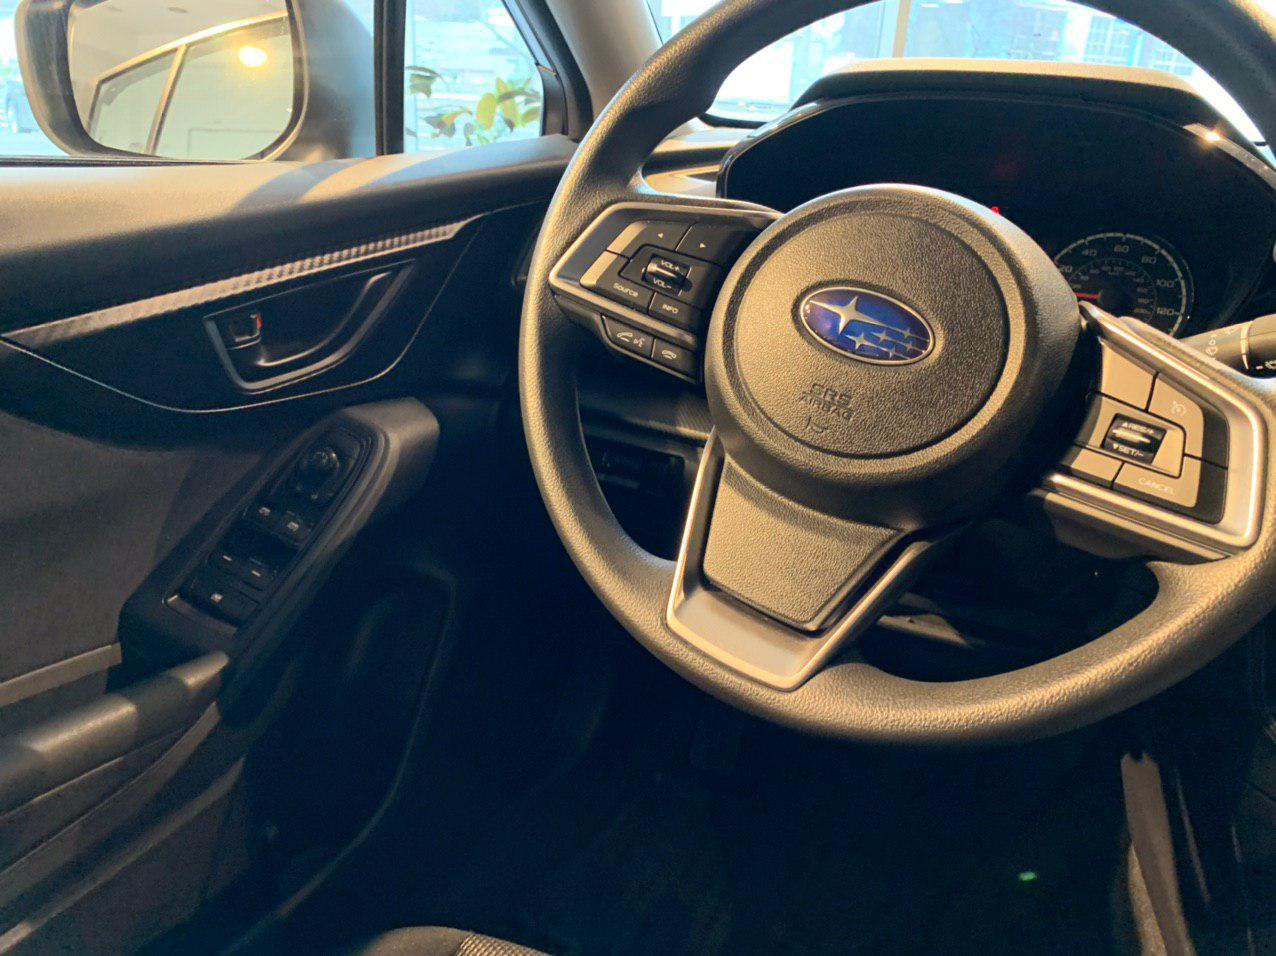 2018 Subaru impreza | Vin: 4S3GKAA64J3618987